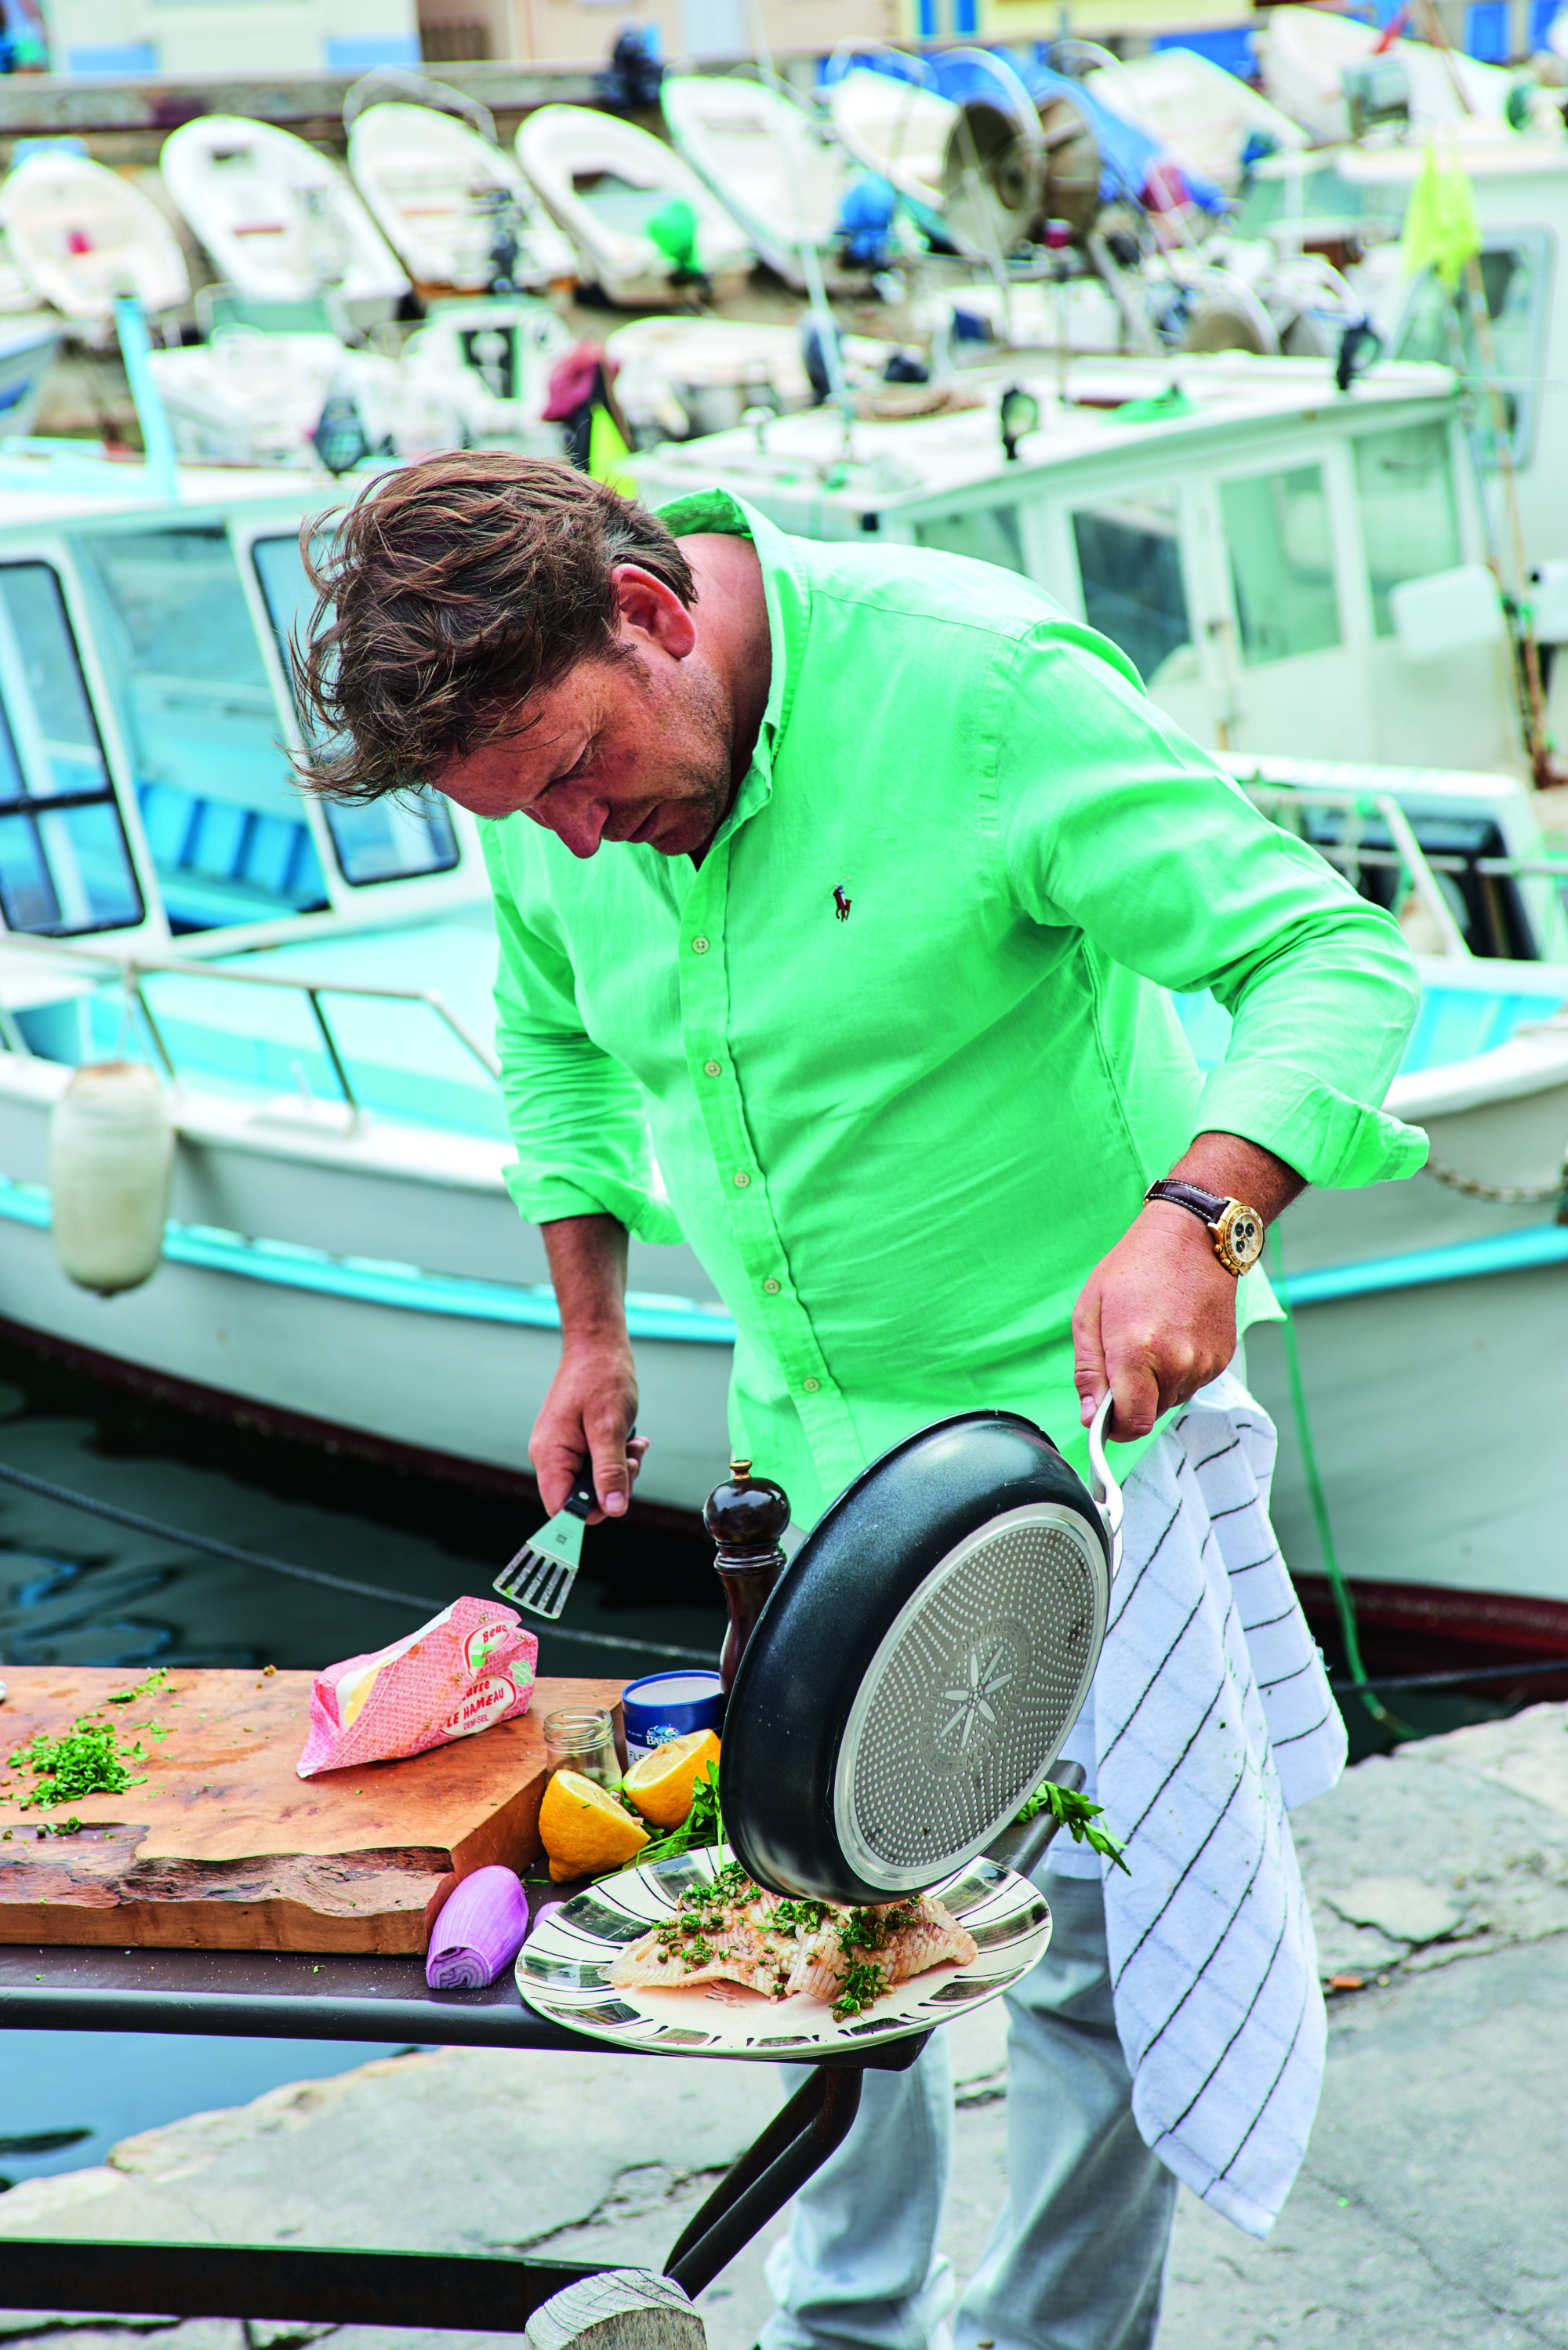 James Martin's Gourmet Road Trip